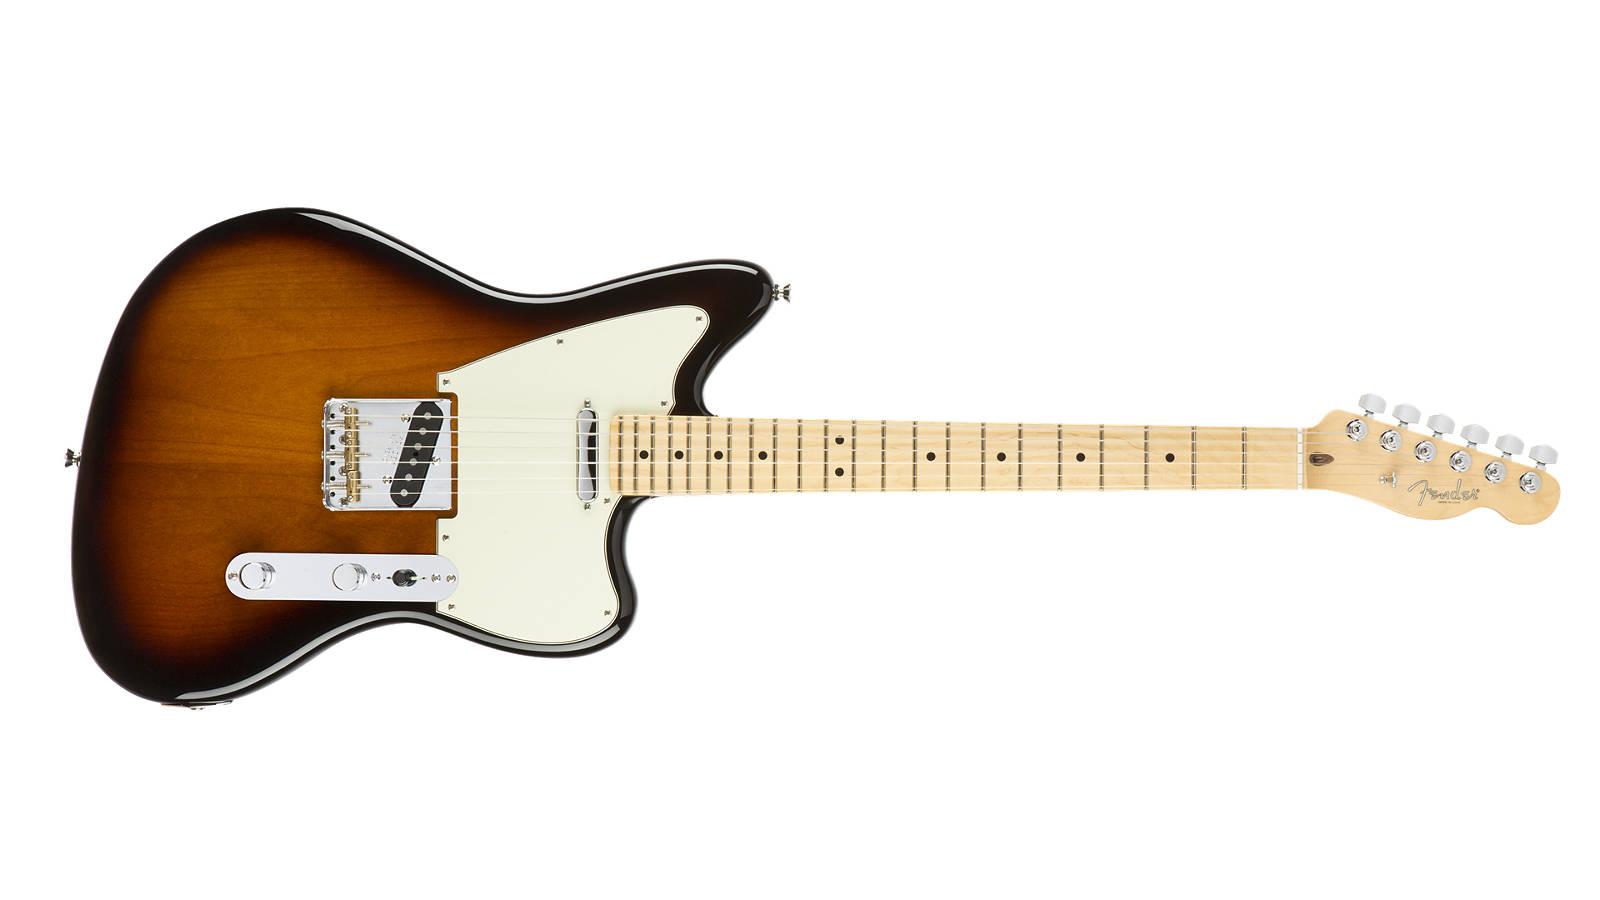 Fender Limited American Offset Telecaster 2-TSB